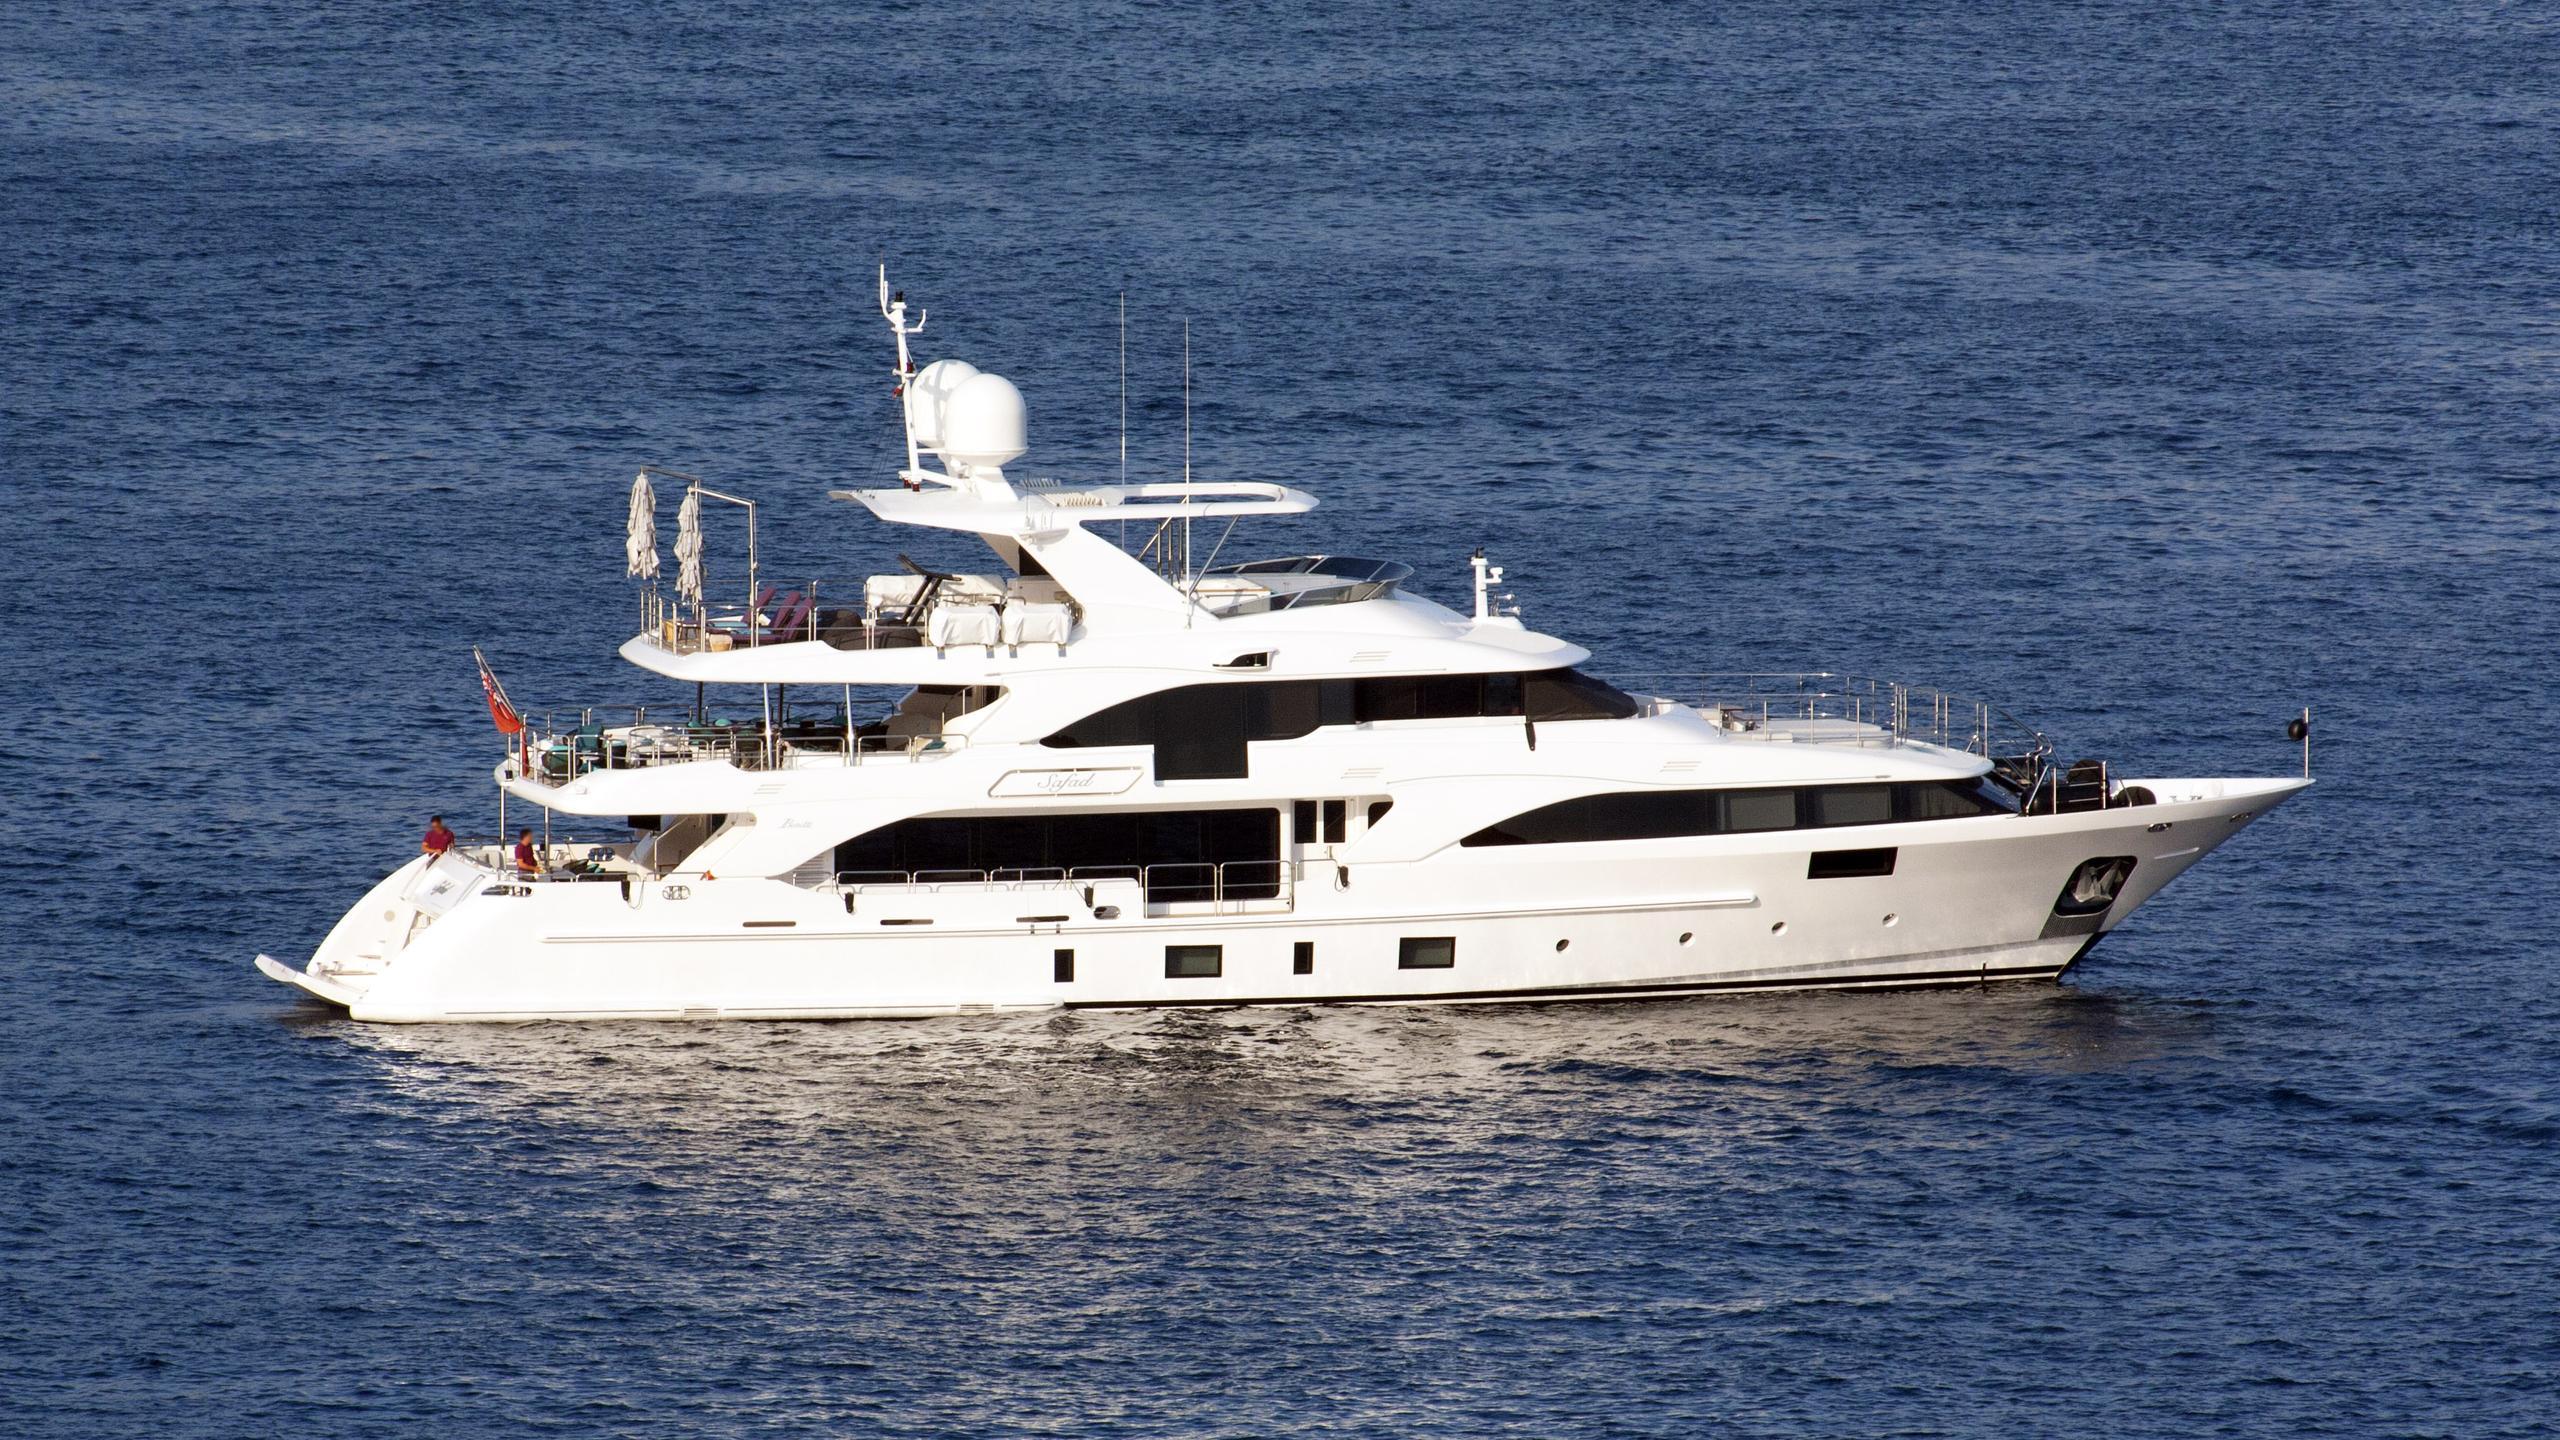 safad motoryacht benetti classic 2015 37m profile